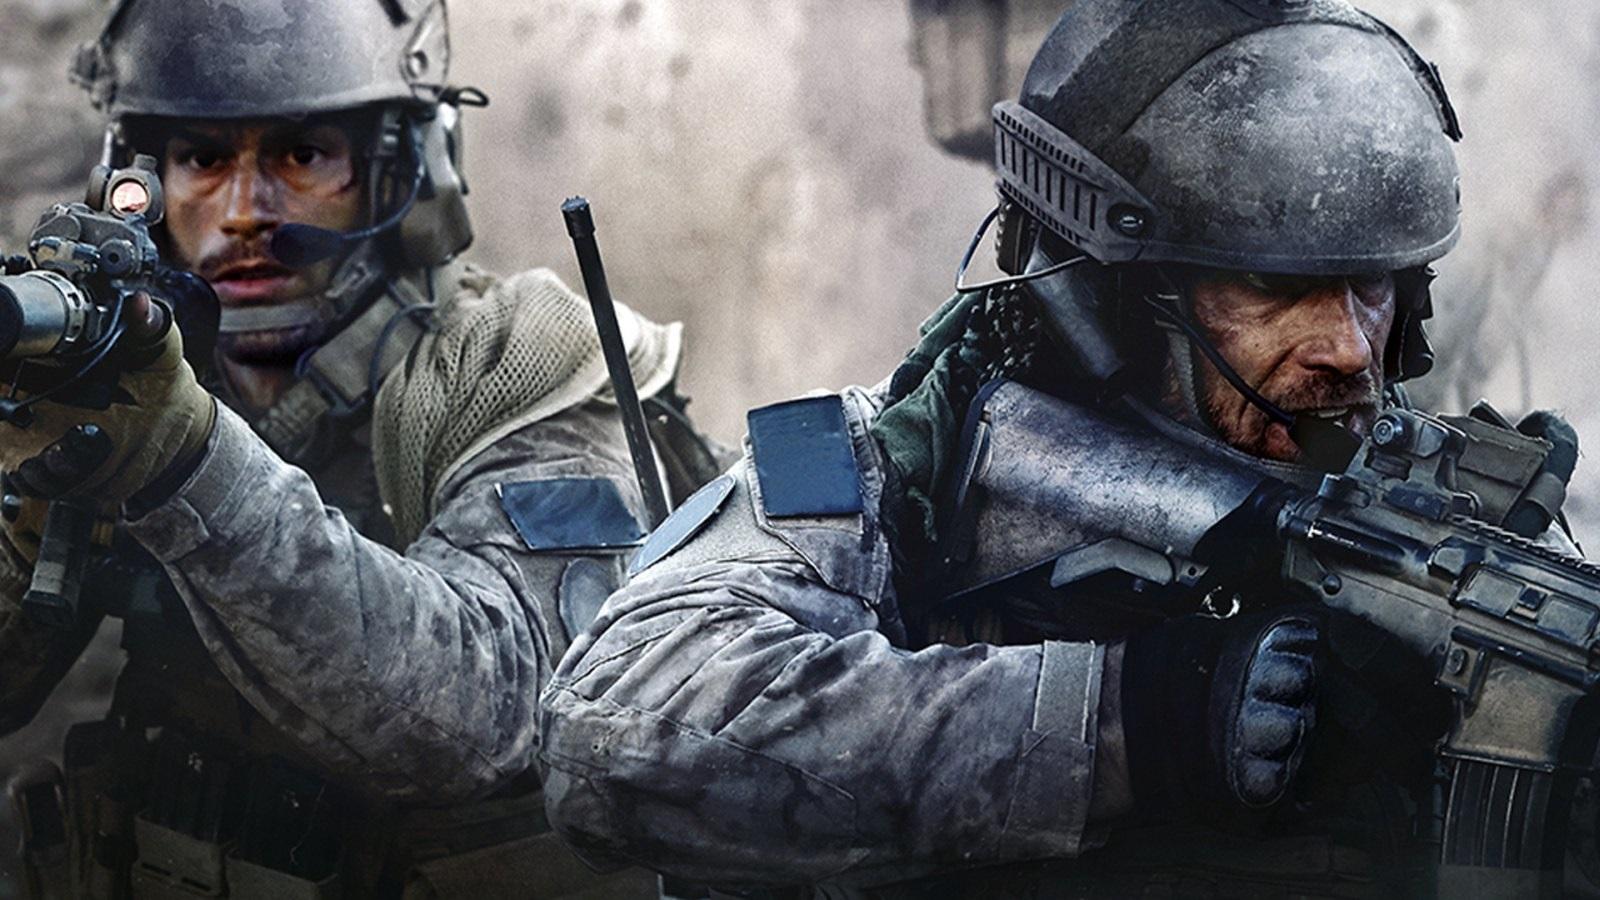 Call of Duty Modern Warfare; screenshot: co-op